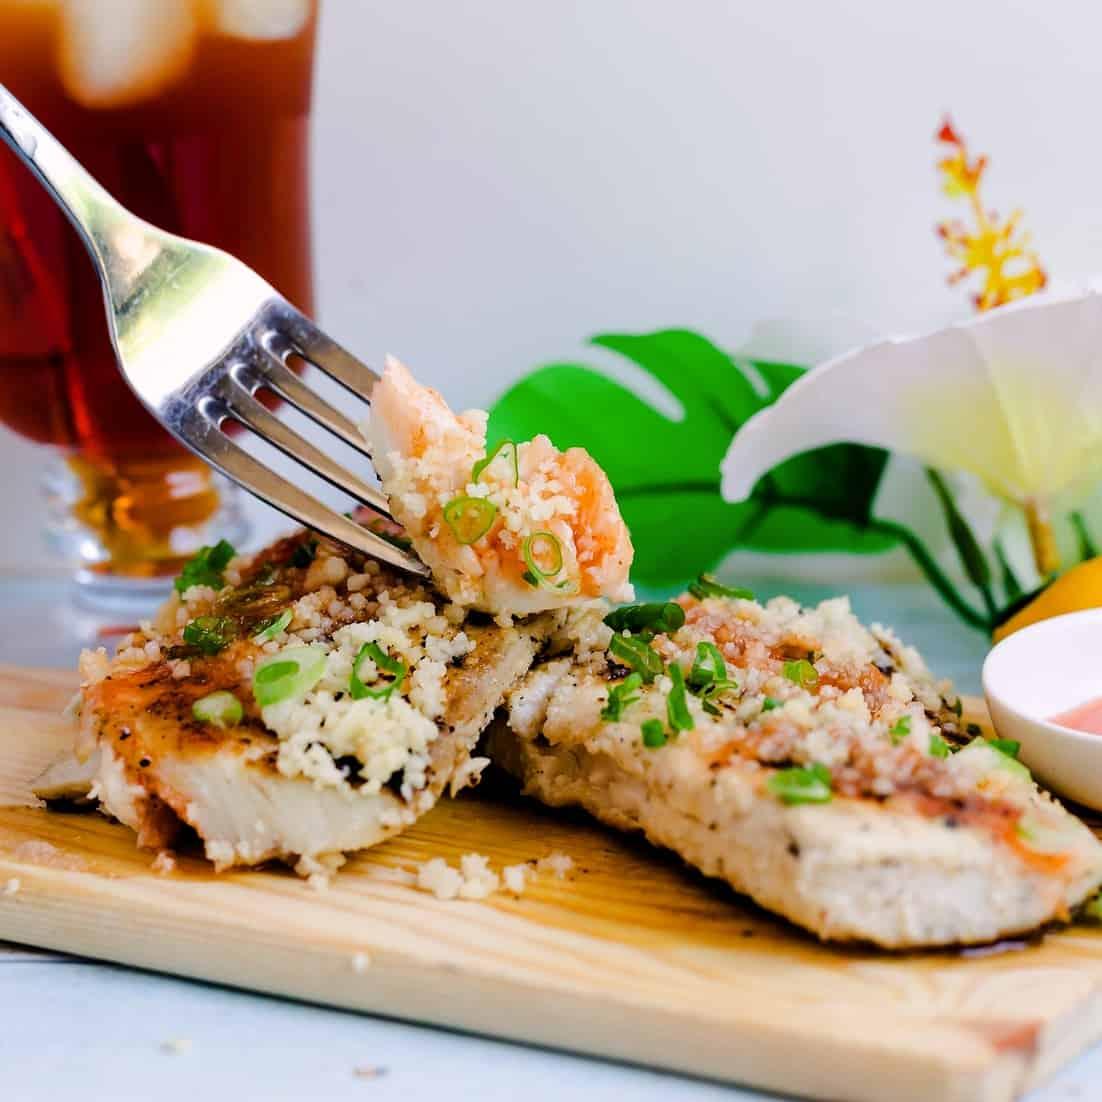 Keto Low Carb Sweet Thai Chili Mahi Mahi LowCarbingAsian Pic 22